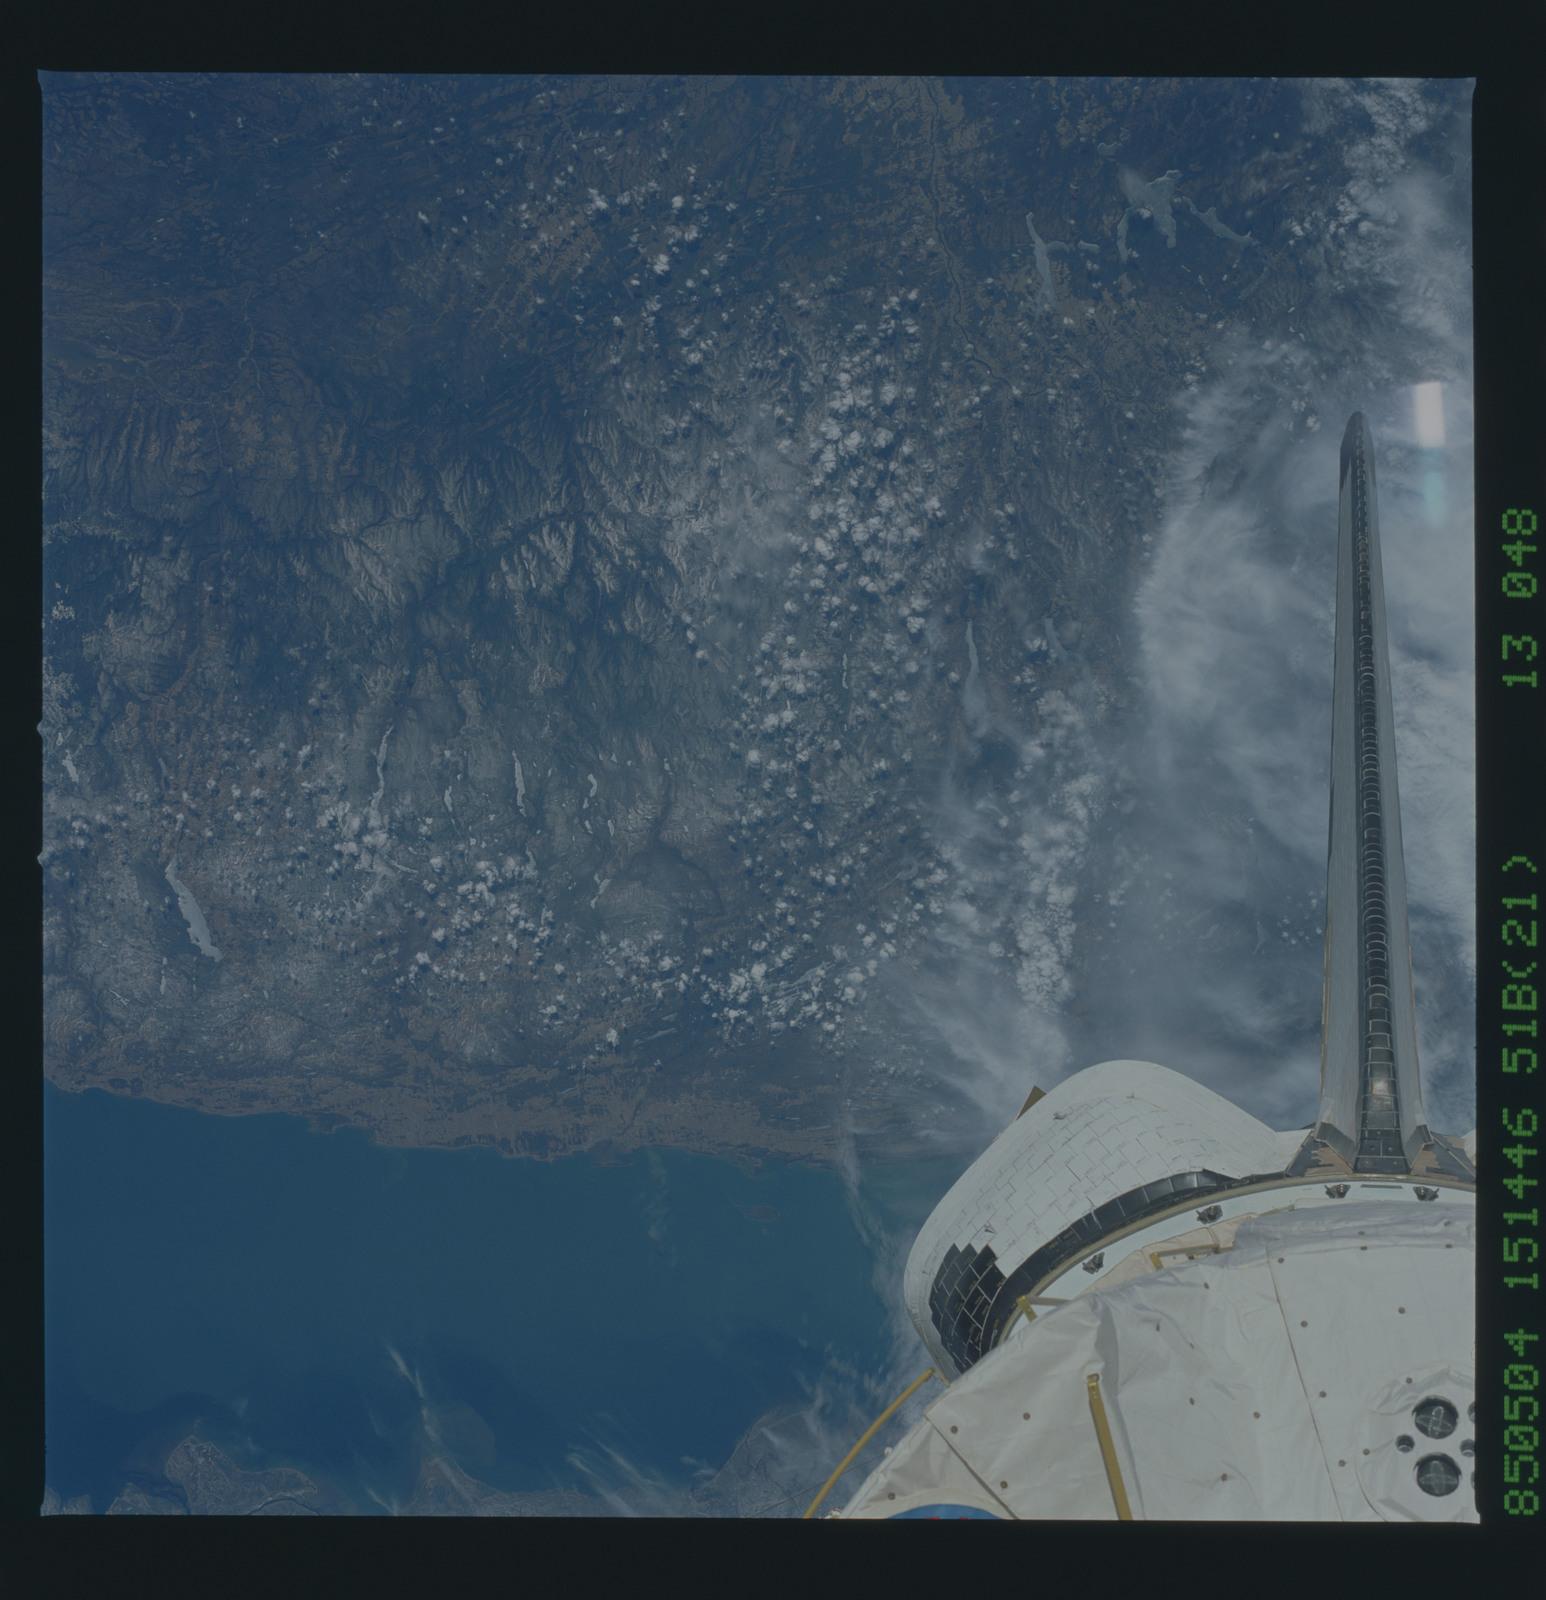 51B-43-048 - STS-51B - 51B earth observation